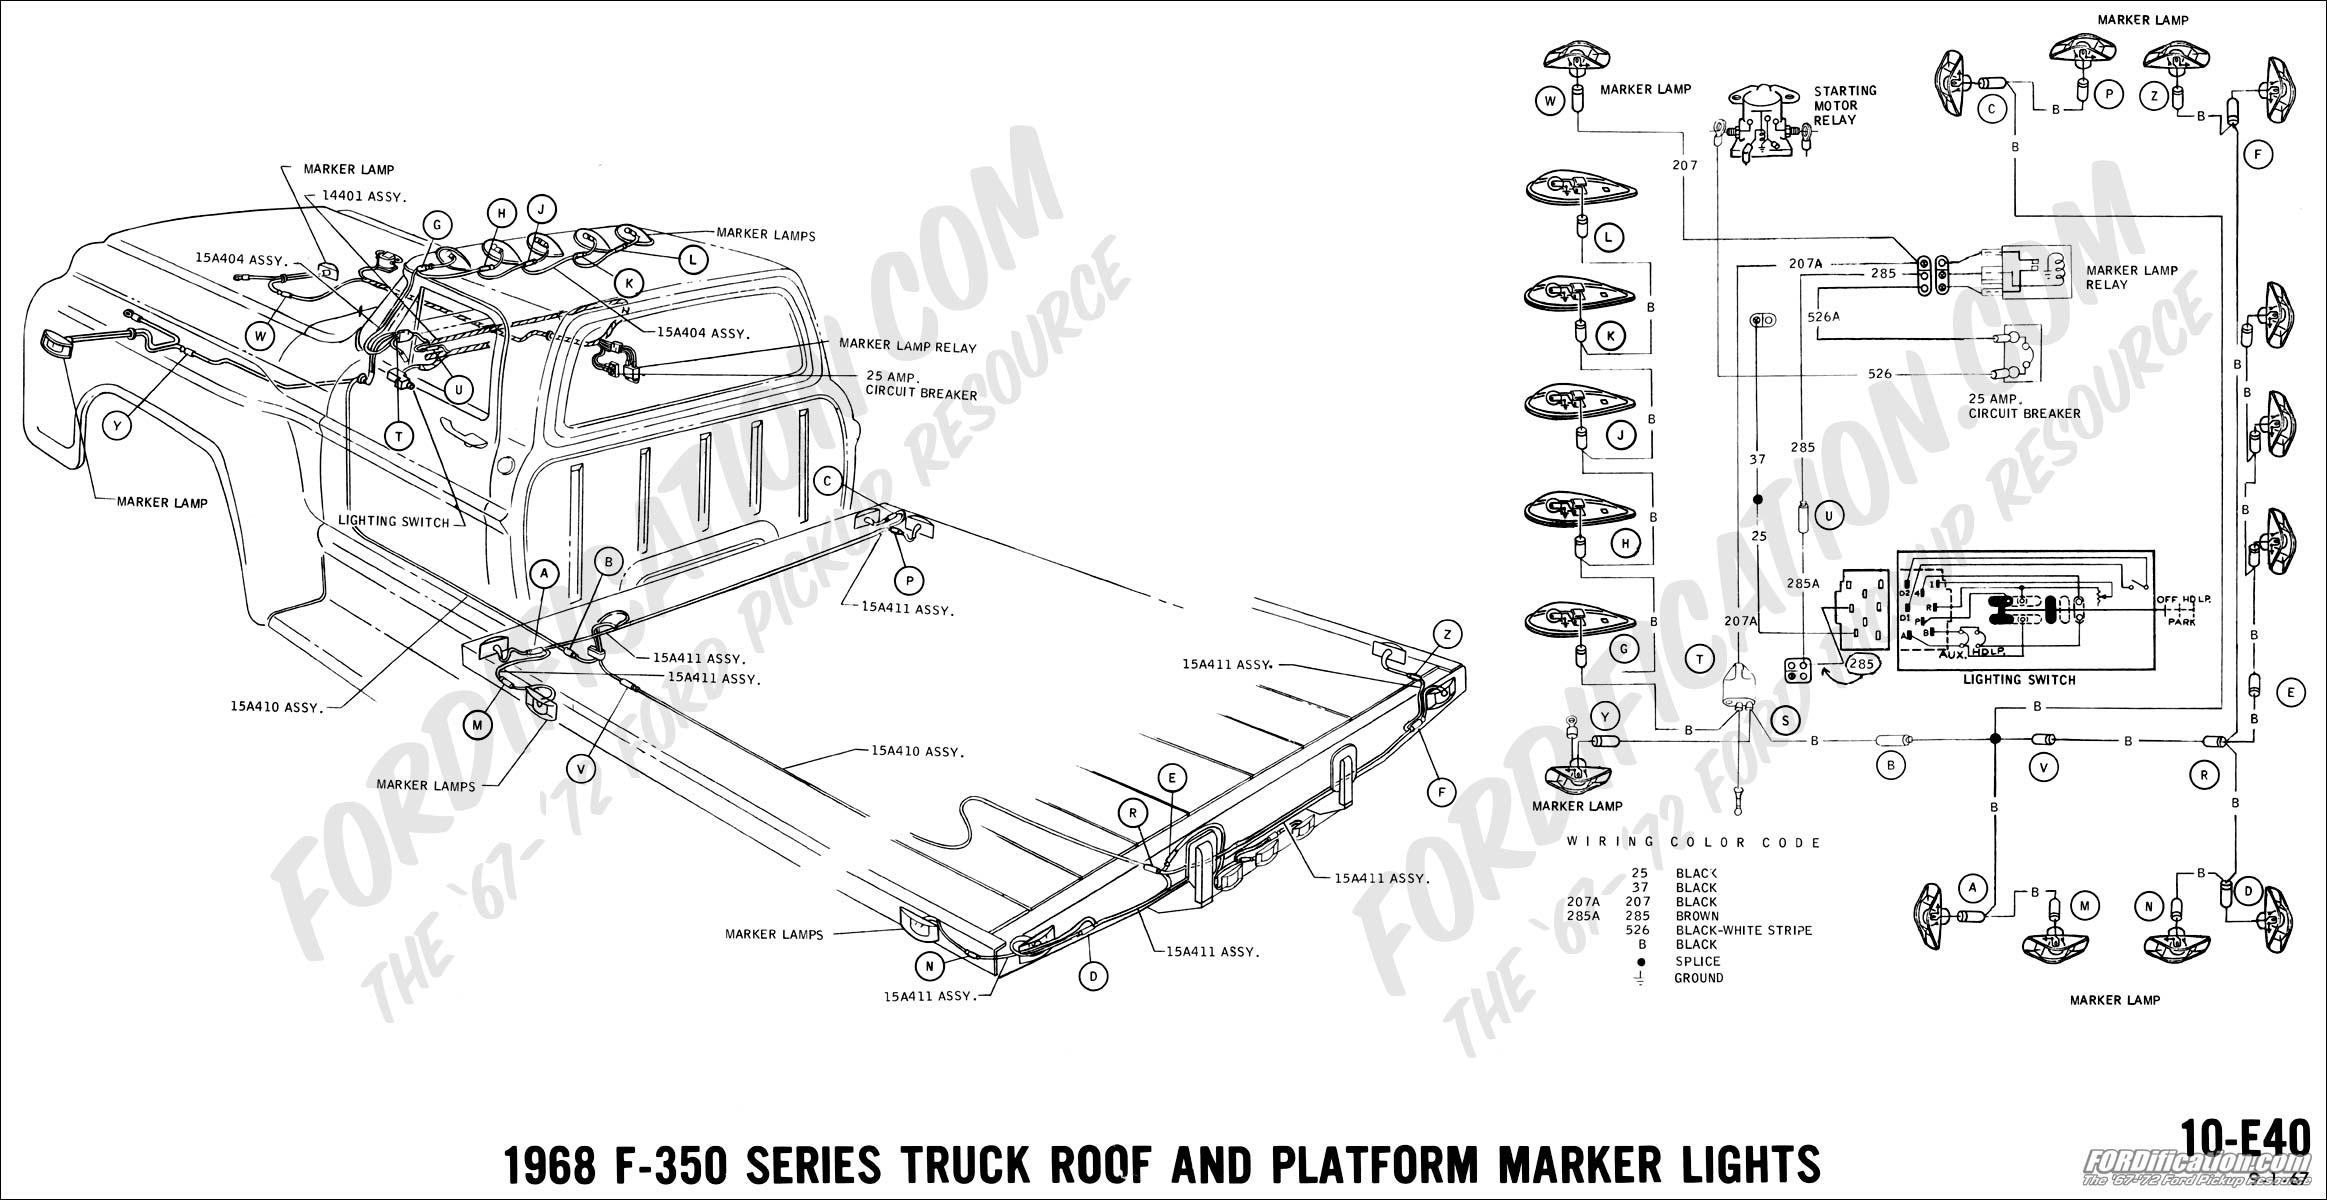 Dodge Flatbed Wiring 2001 Chevy 2 4 Engine Diagram Hose 800sss Nikotin5 Jeanjaures37 Fr